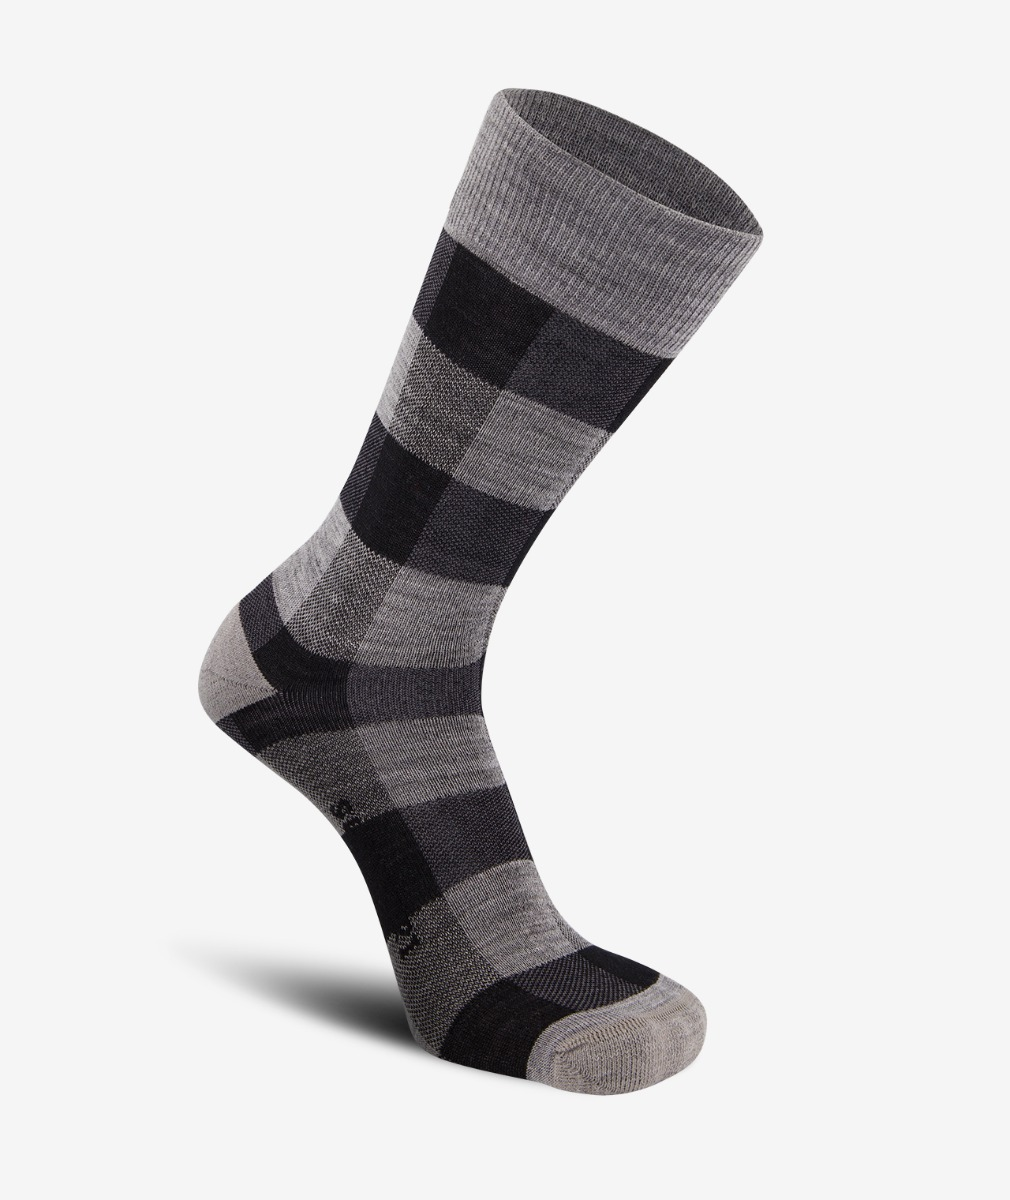 Swanndri Colombo Check Merino Sock in Grey Check